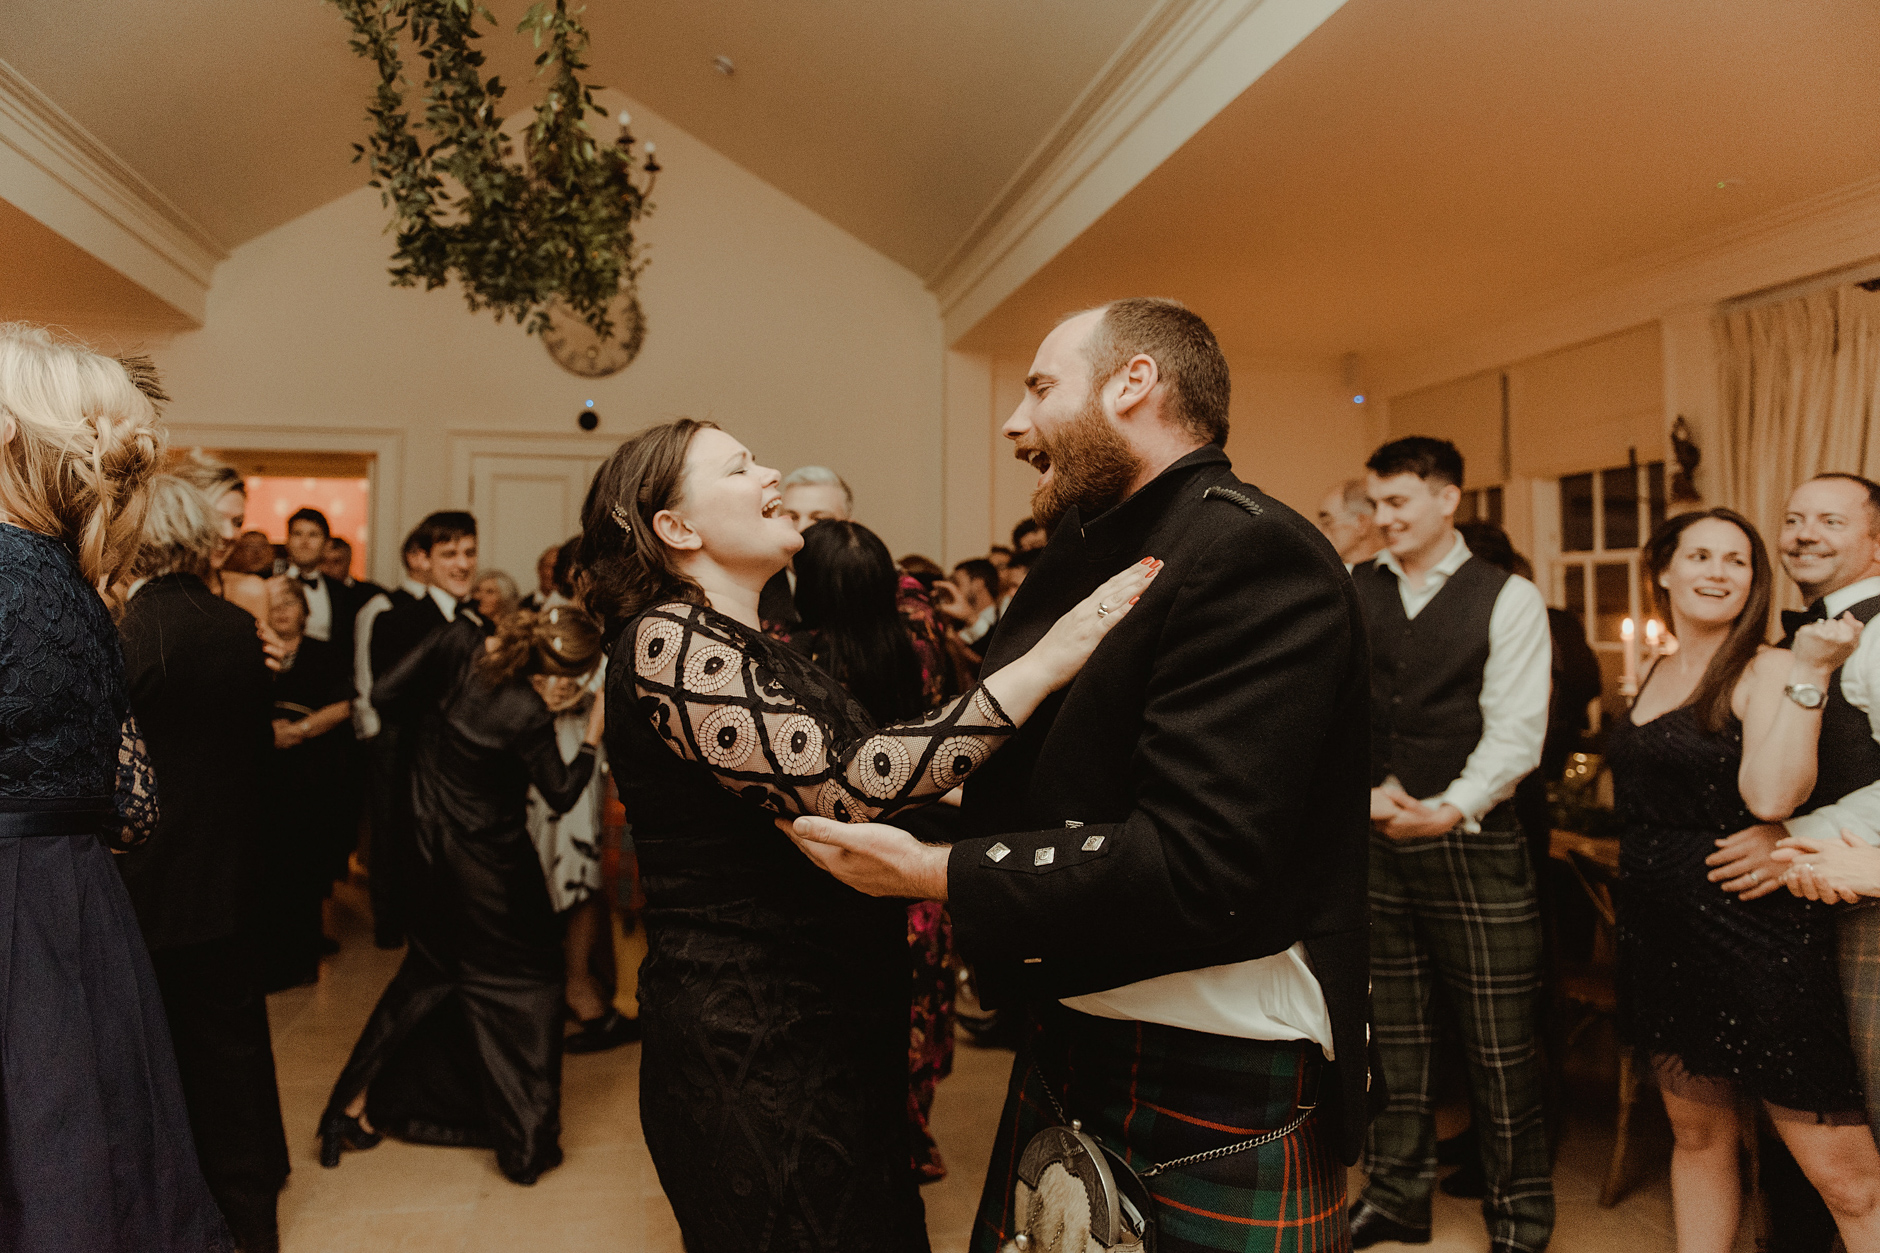 Glentruim-Wedding-Nikki-Leadbetter-Photography-357.jpg